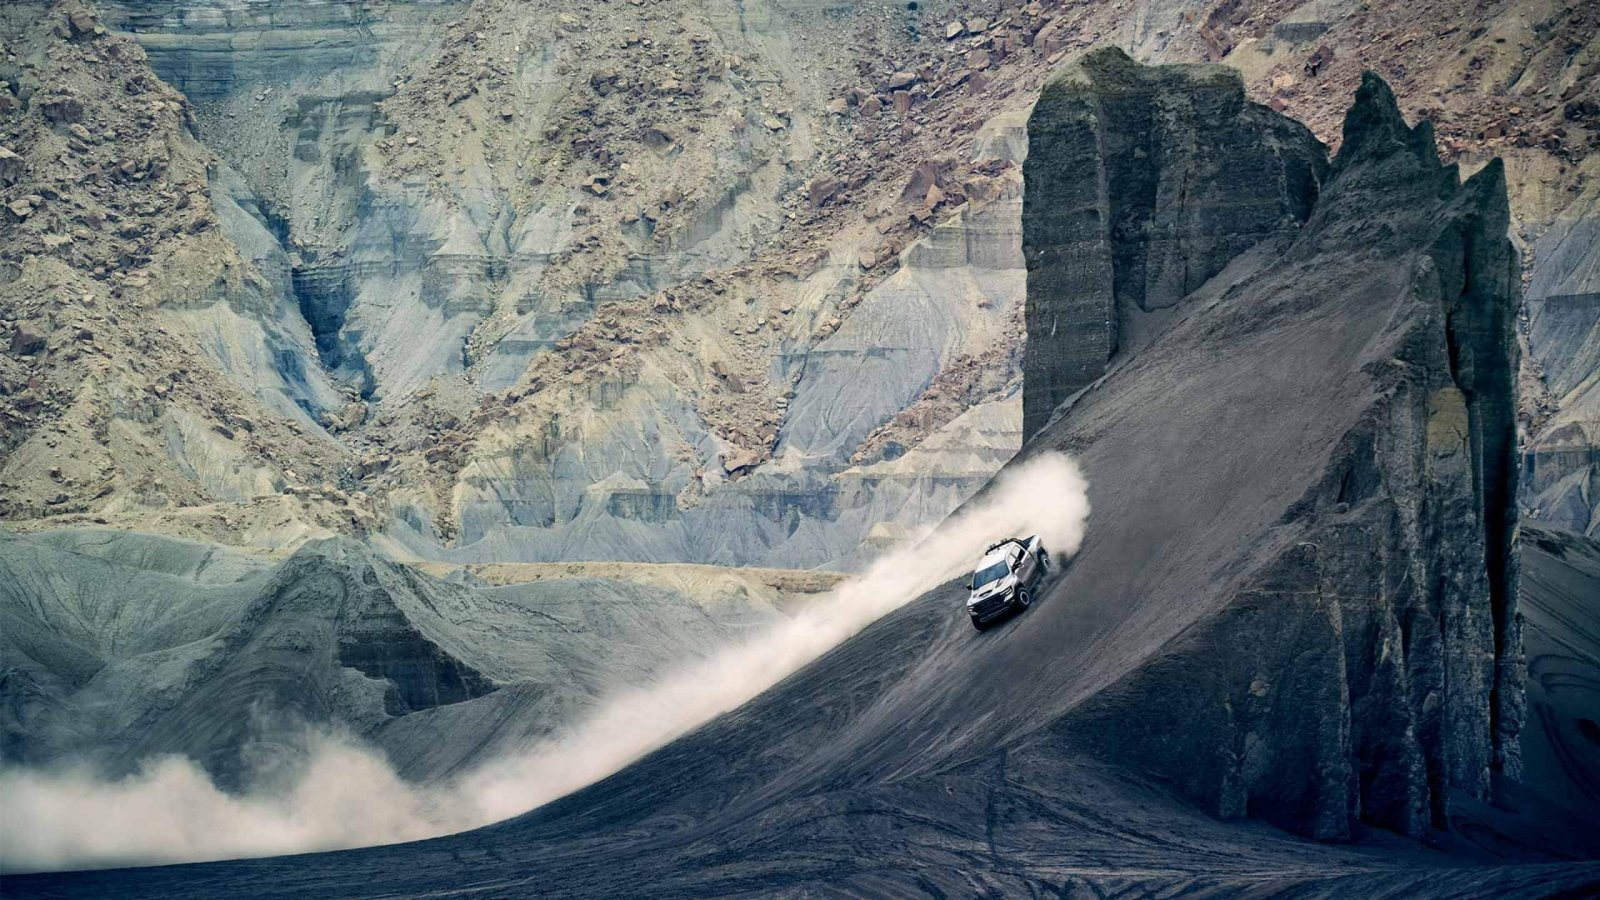 TRX_Cliff-Speed.jpg.image.2880.jpg